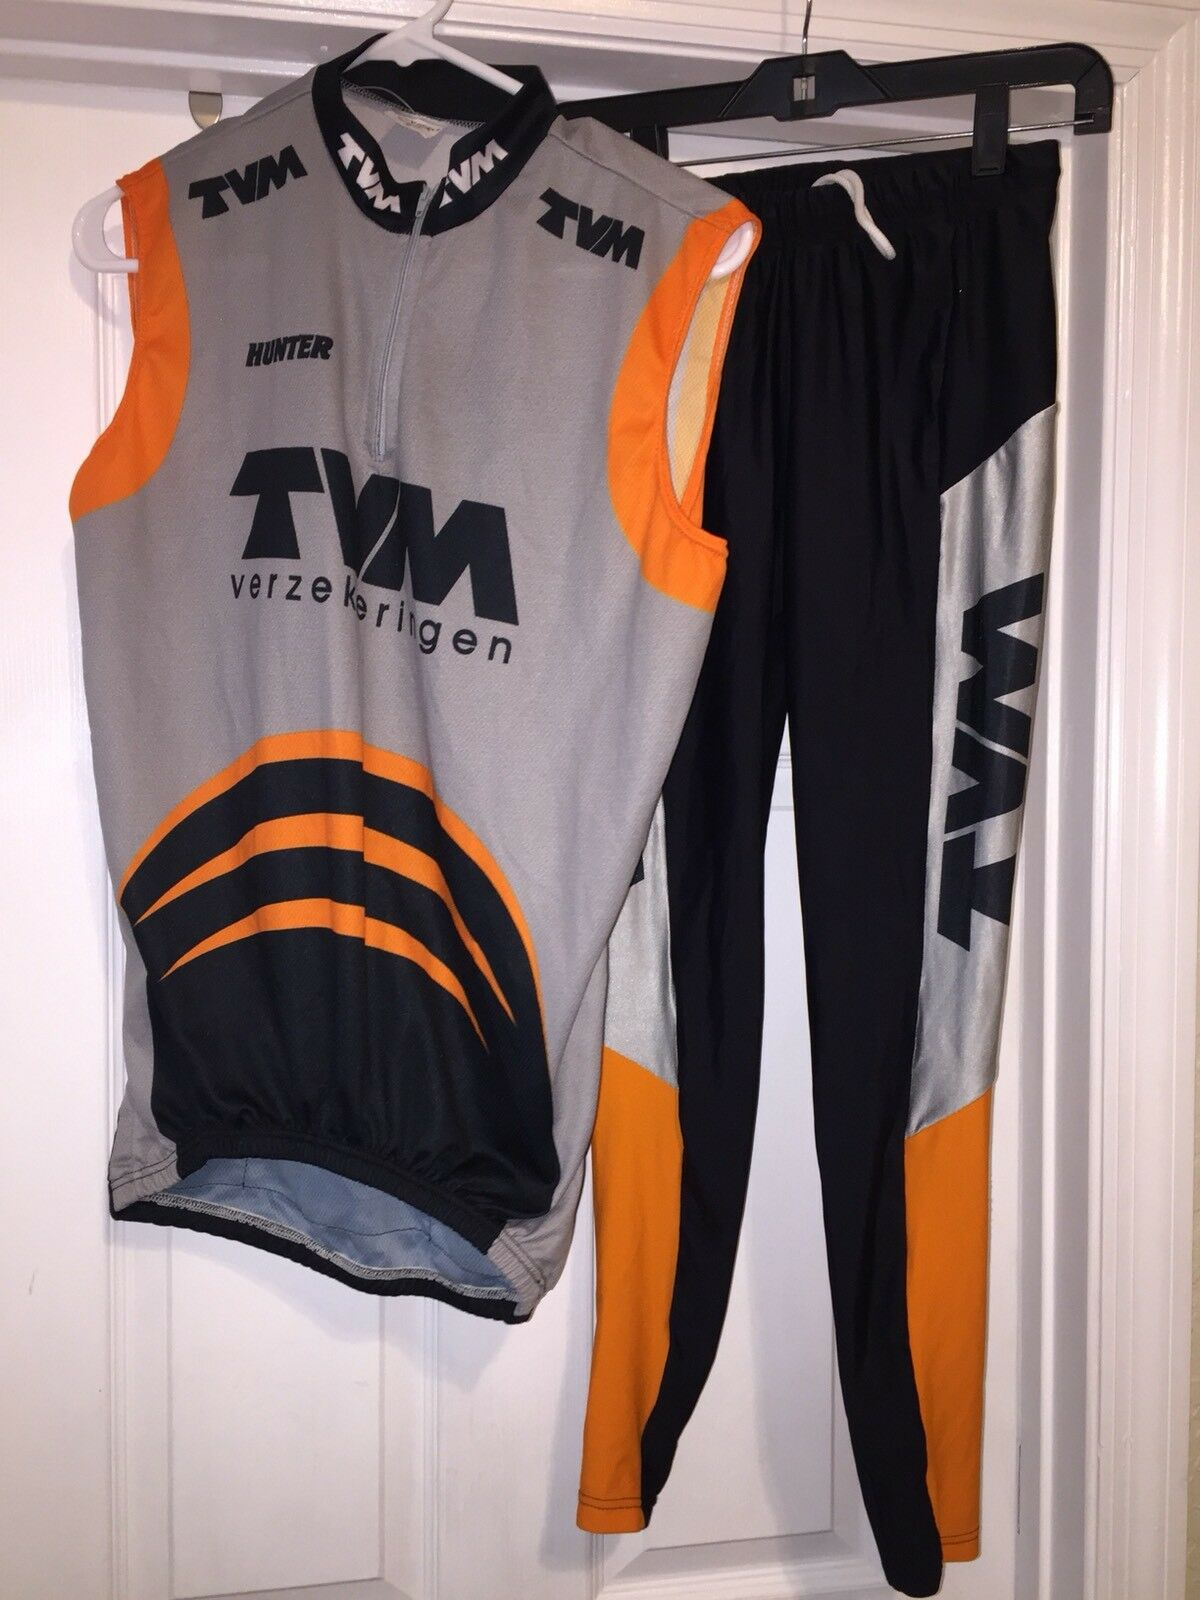 TVM Verzekeringen Cycling  Team T Suit Decathalon Hunter Triathalon Medium RARE   official authorization